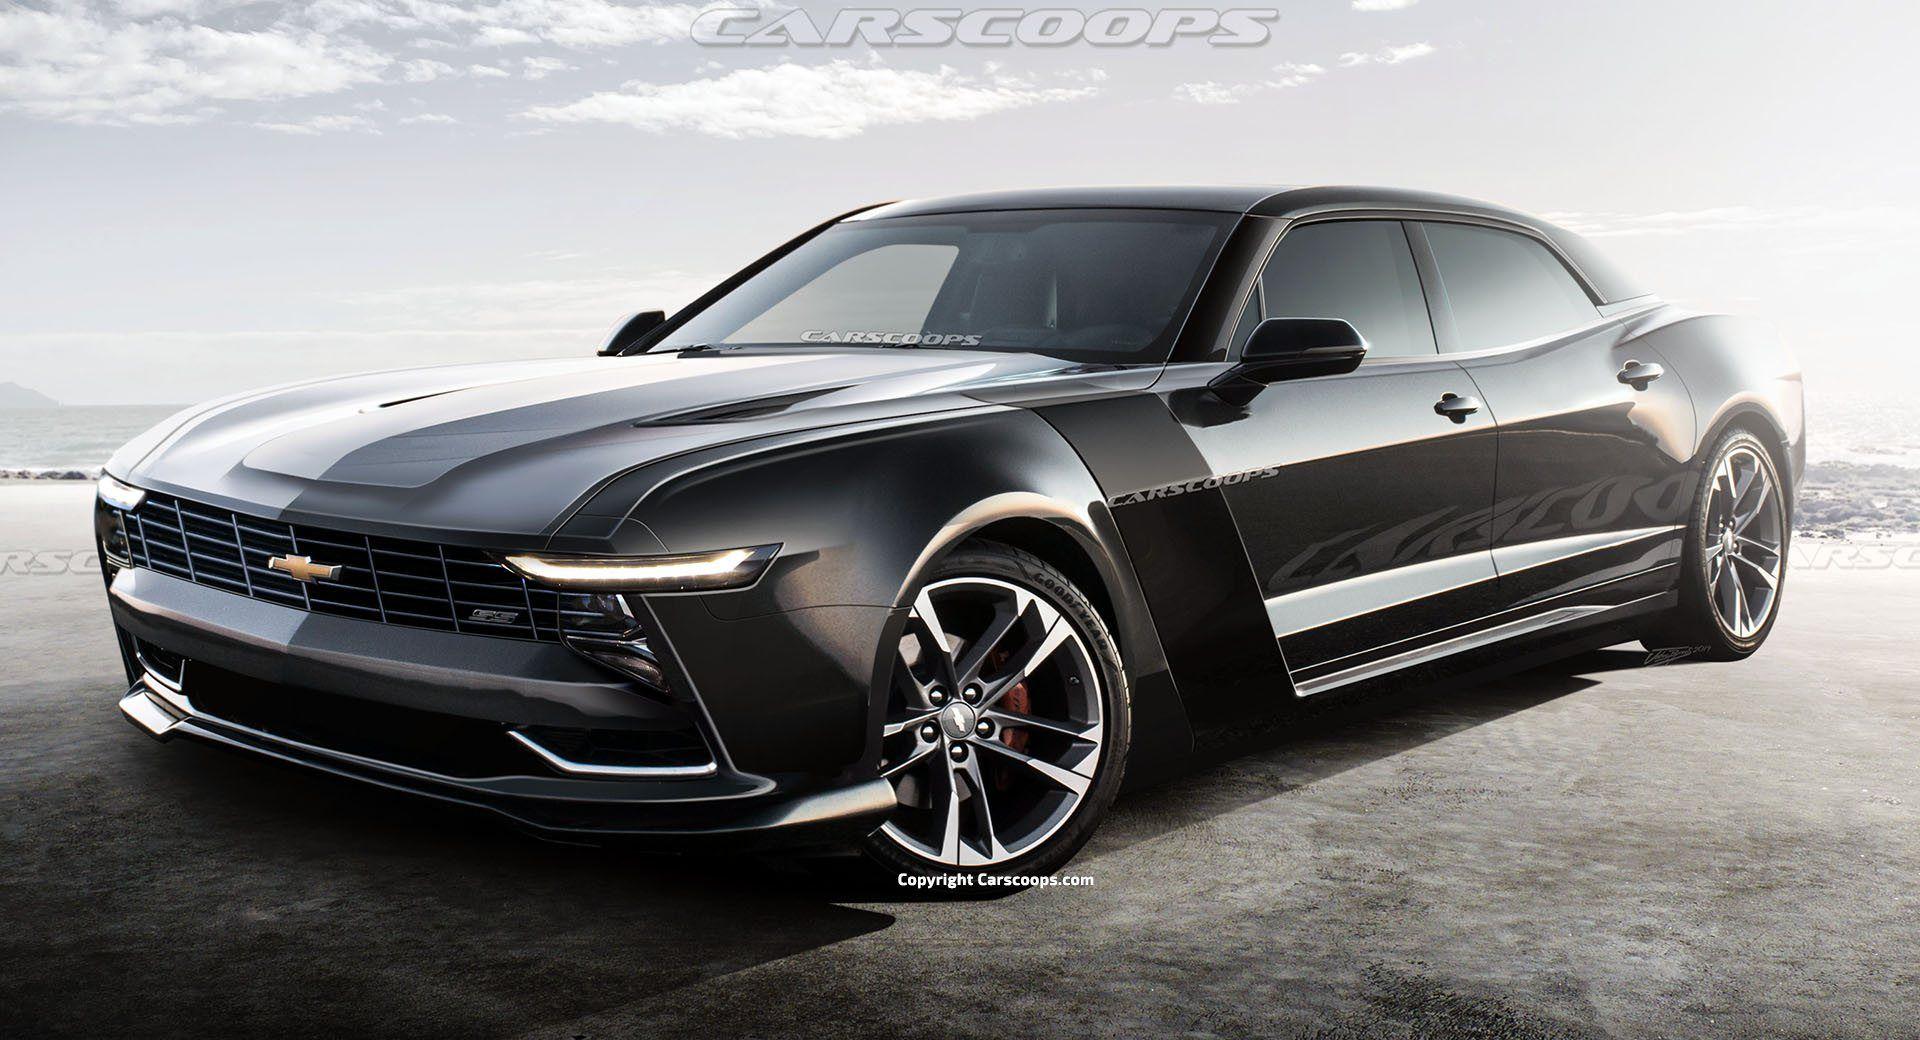 2021 Citroen C4 New Concept in 2020 Chevrolet impala